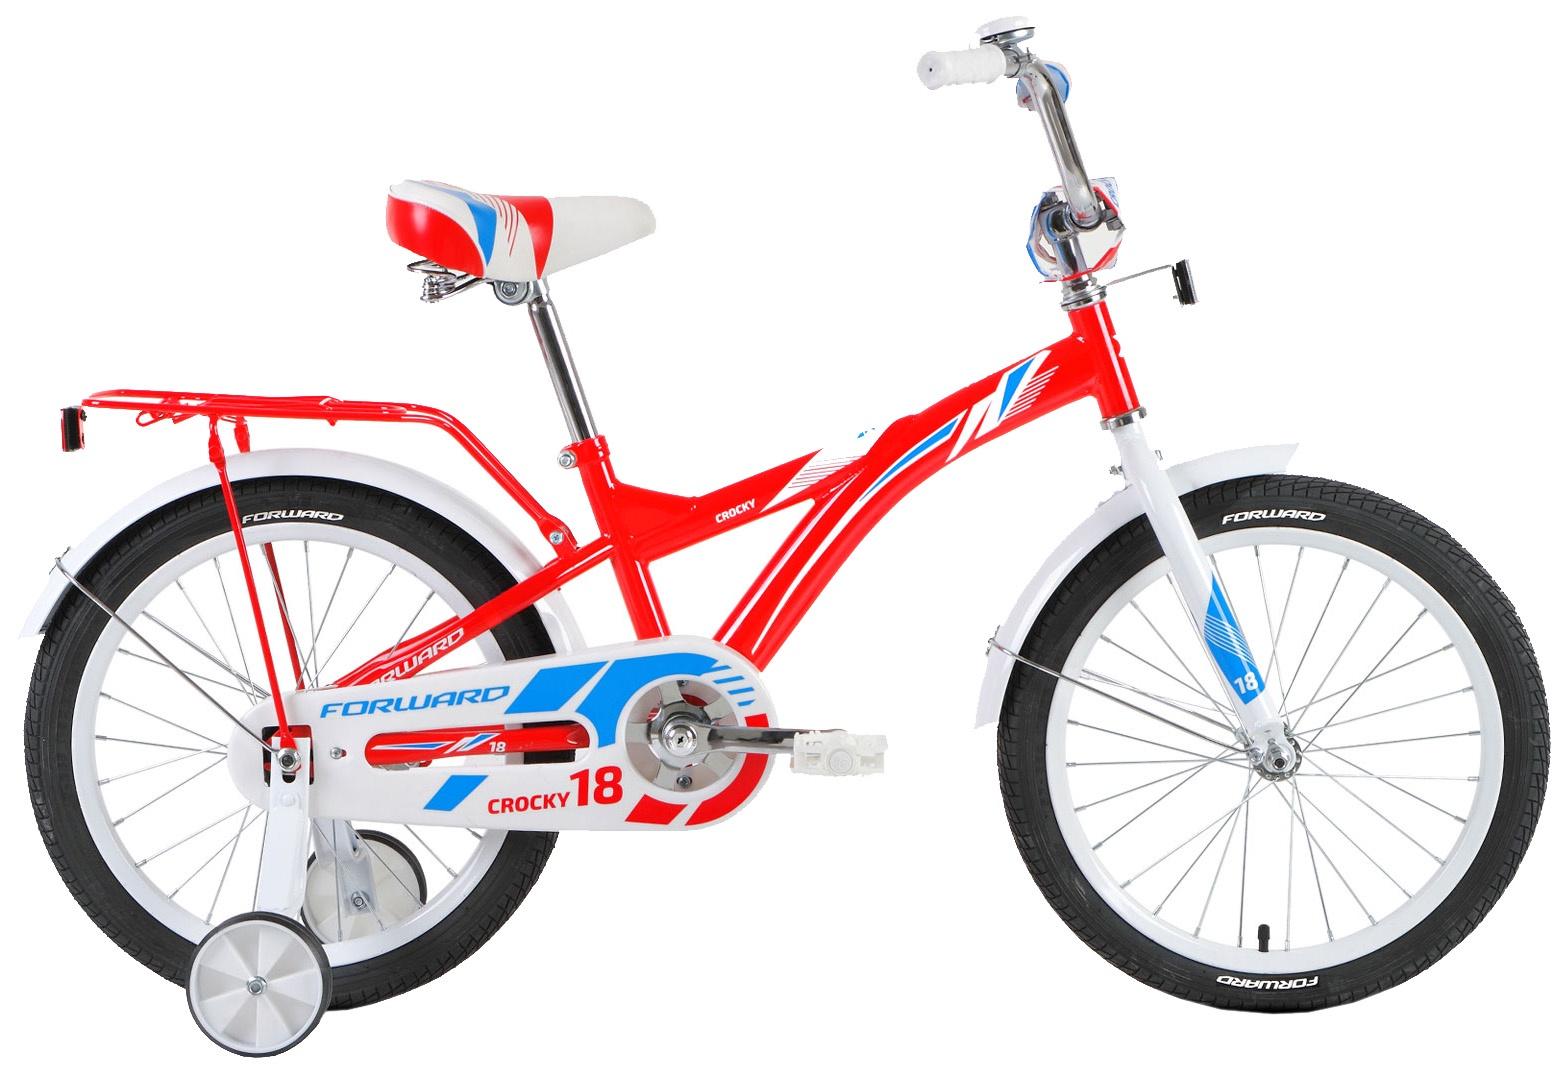 Велосипед Forward CROCKY 18 2018, RBKW8LNH1016, красный